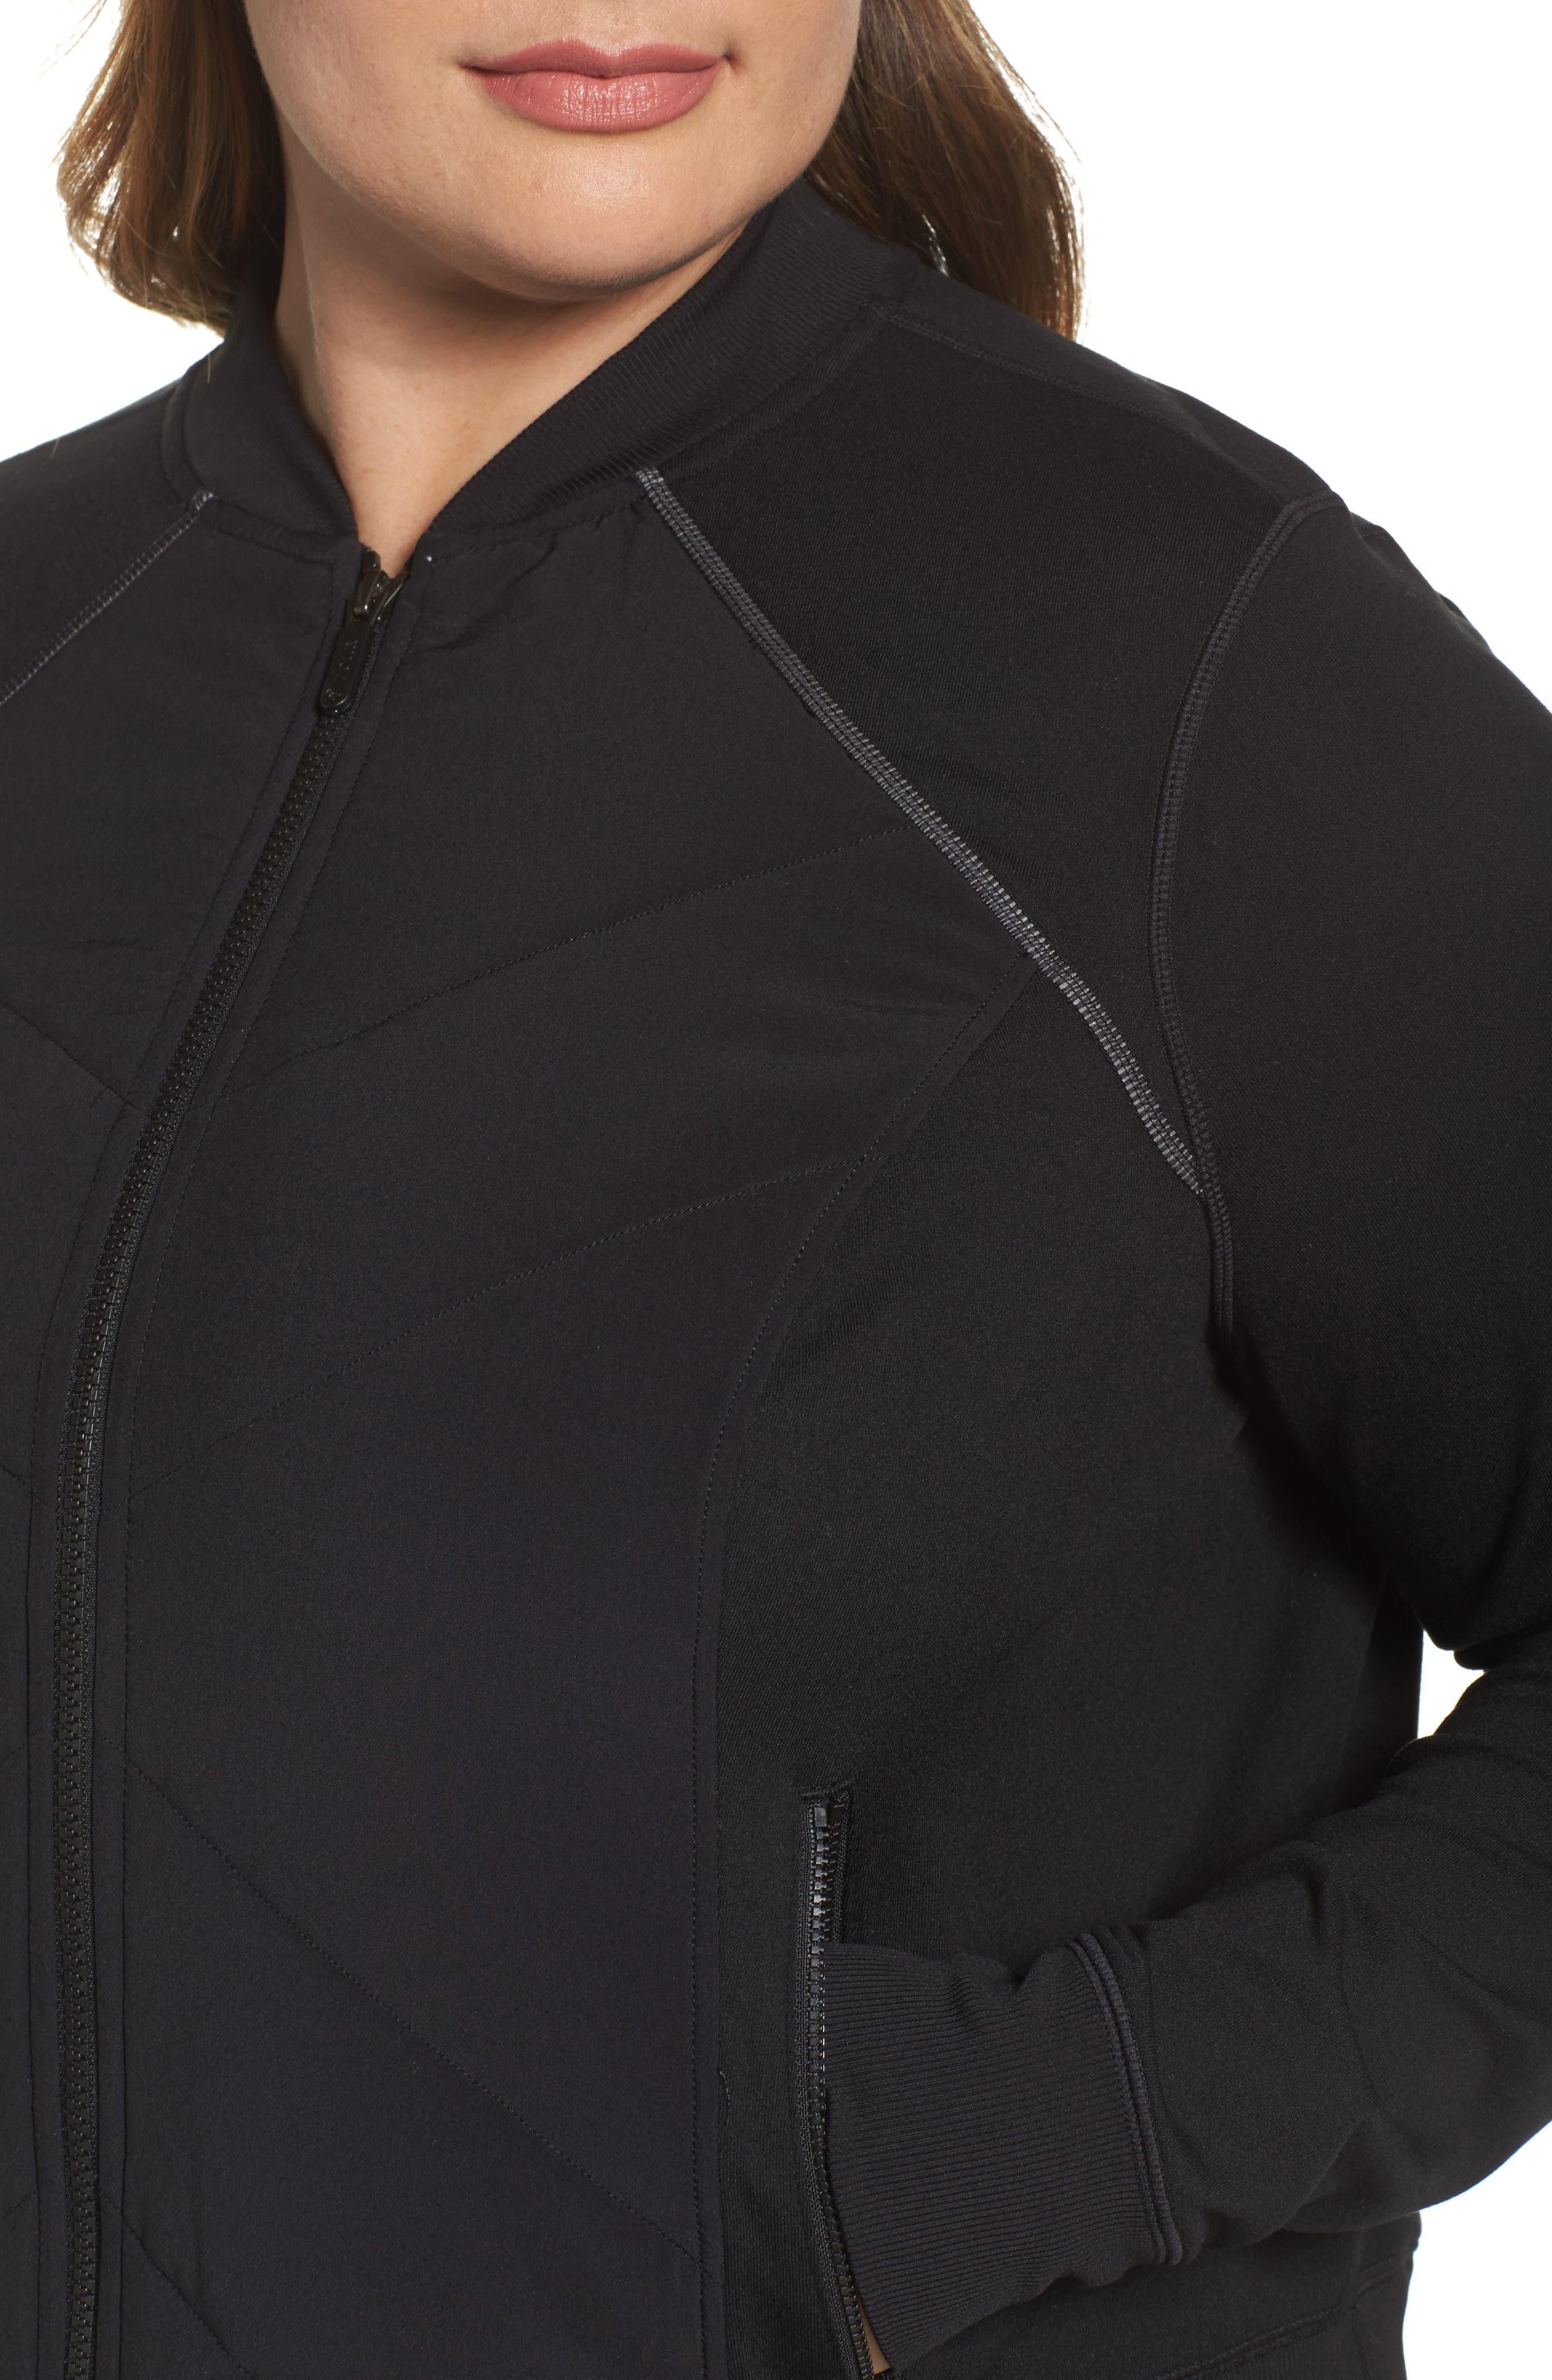 Wear It Out Bomber Jacket,                             Alternate thumbnail 3, color,                             Black